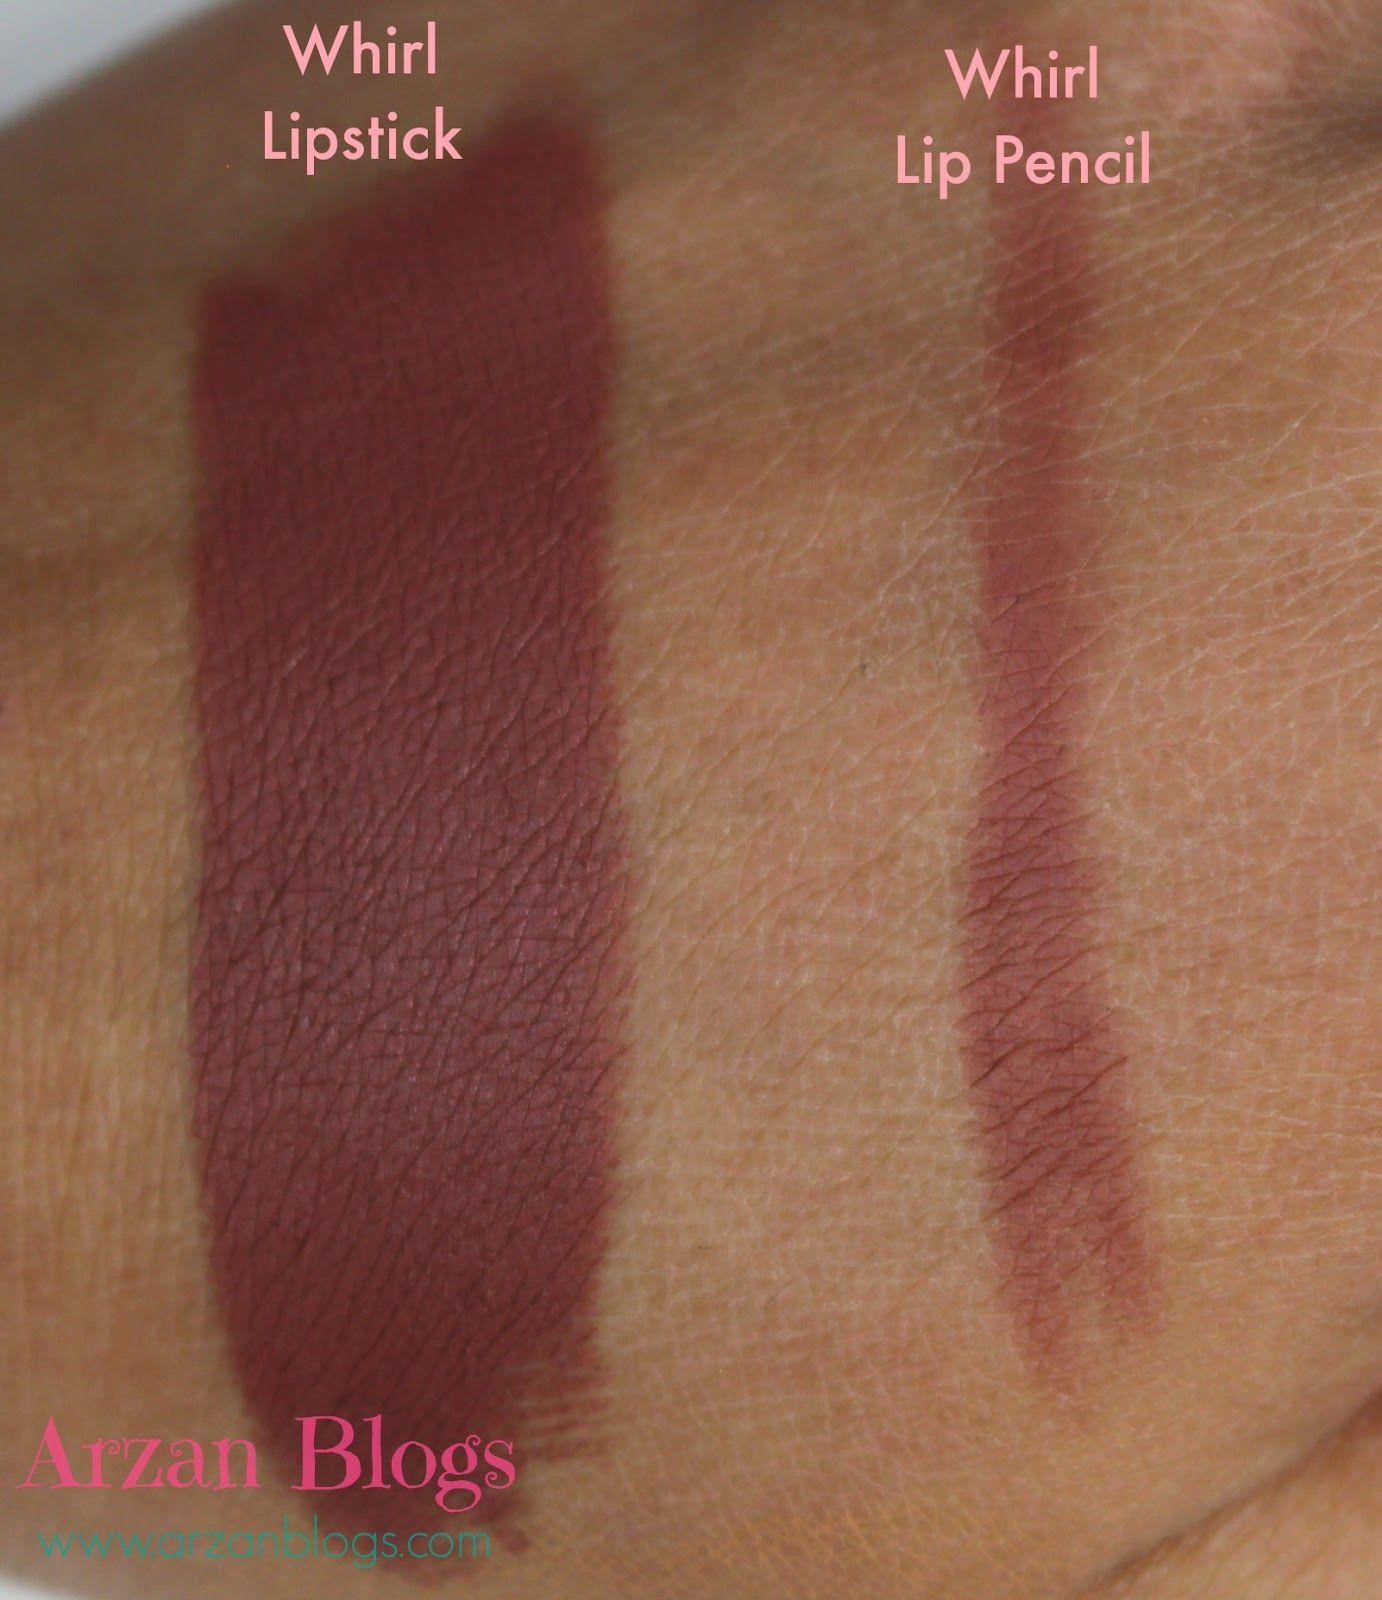 Bien-aimé whirl mac lipstick - Αναζήτηση Google   Wish list for make up  JB58